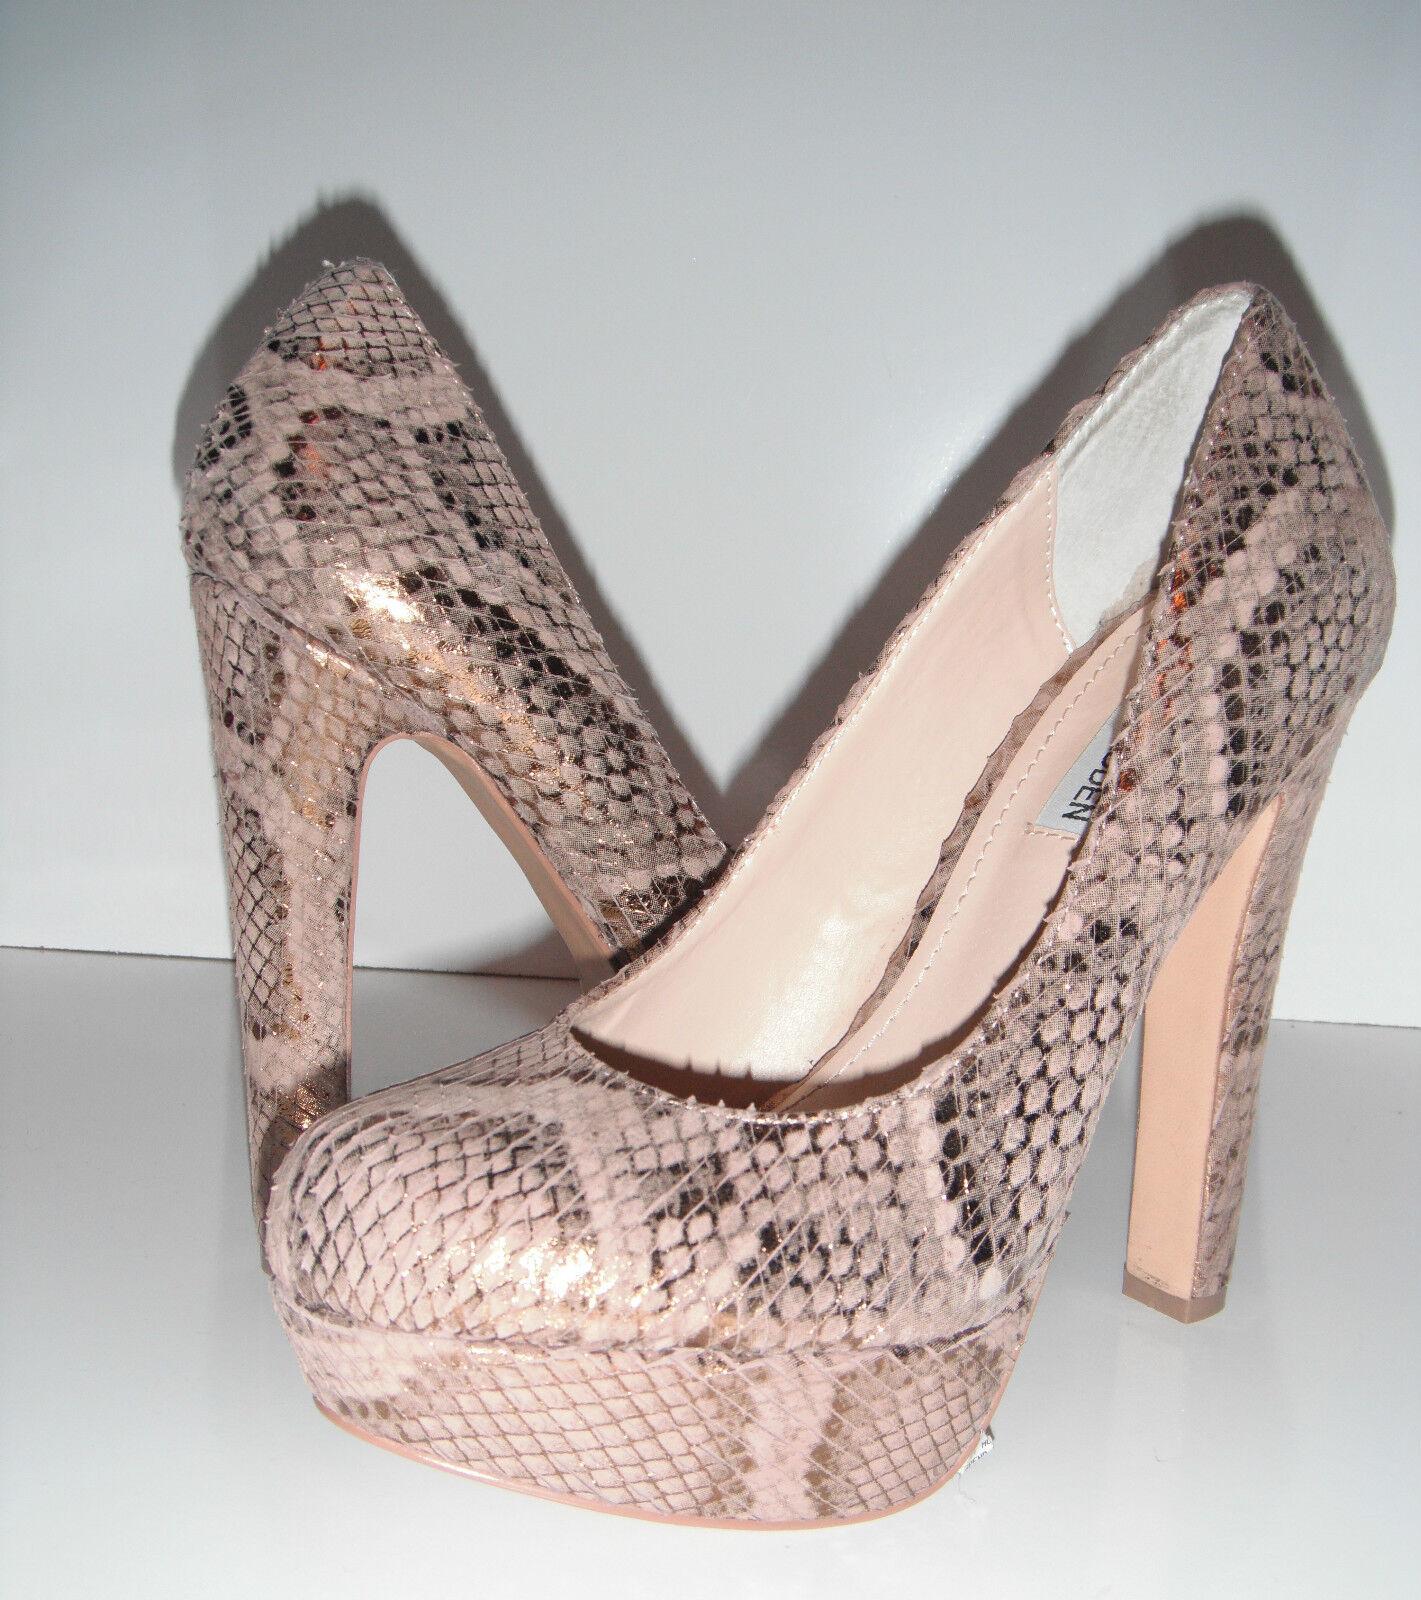 acquisto limitato New Glamorous Steve Madden  Beasst-S Beasst-S Beasst-S Snake Print Heel Platform scarpe sz 7M  125  ordina ora goditi un grande sconto